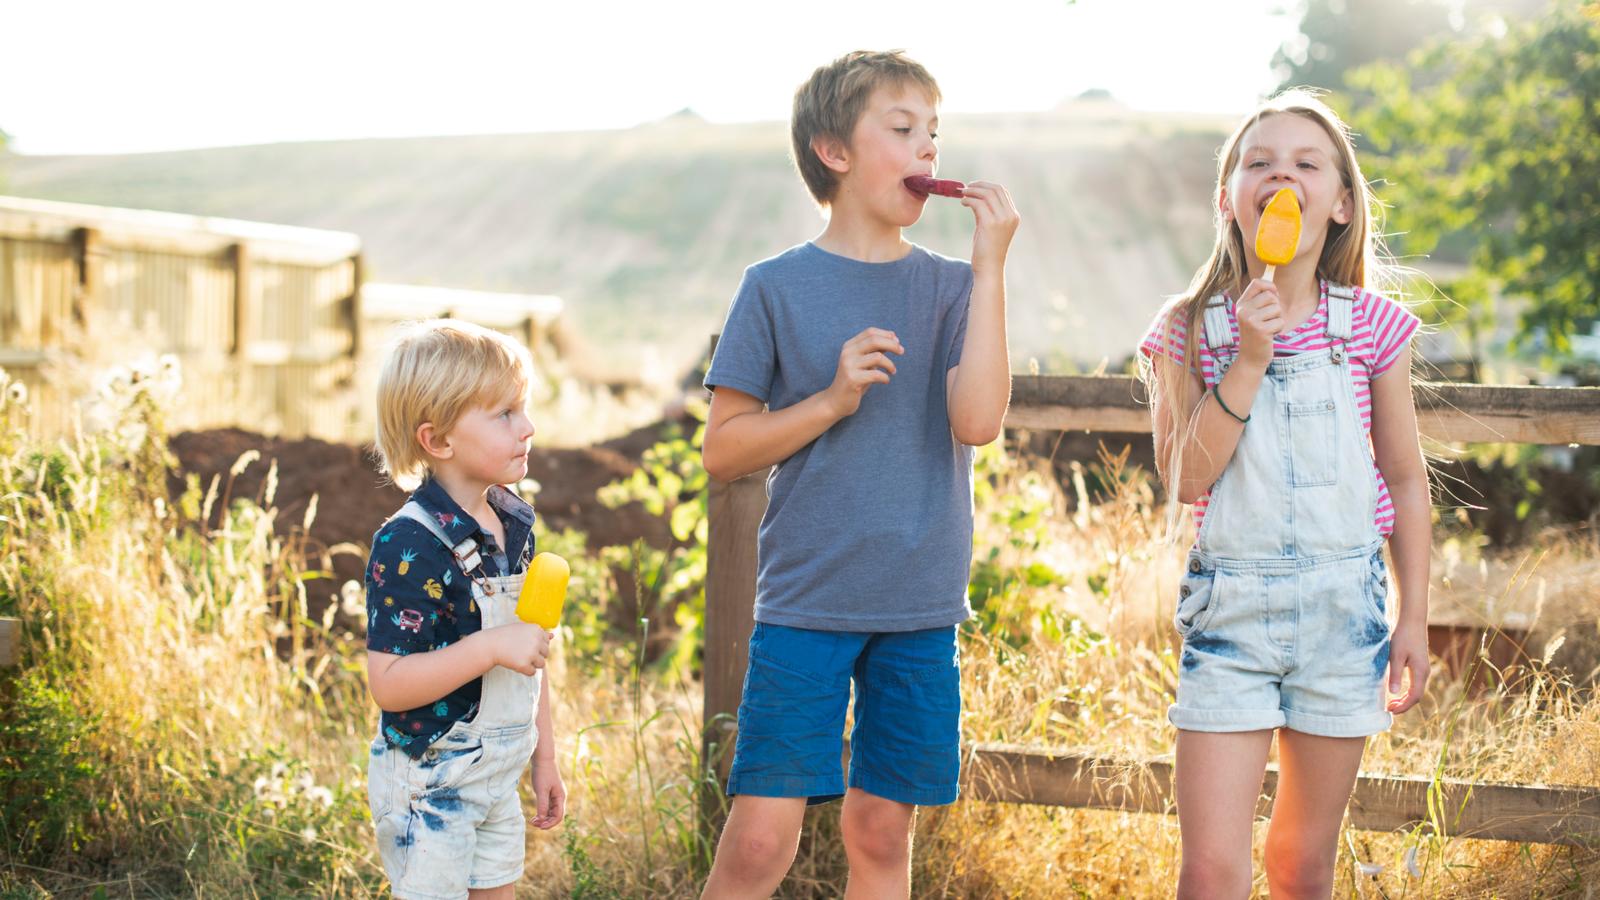 Kids eating ice popsicles outside